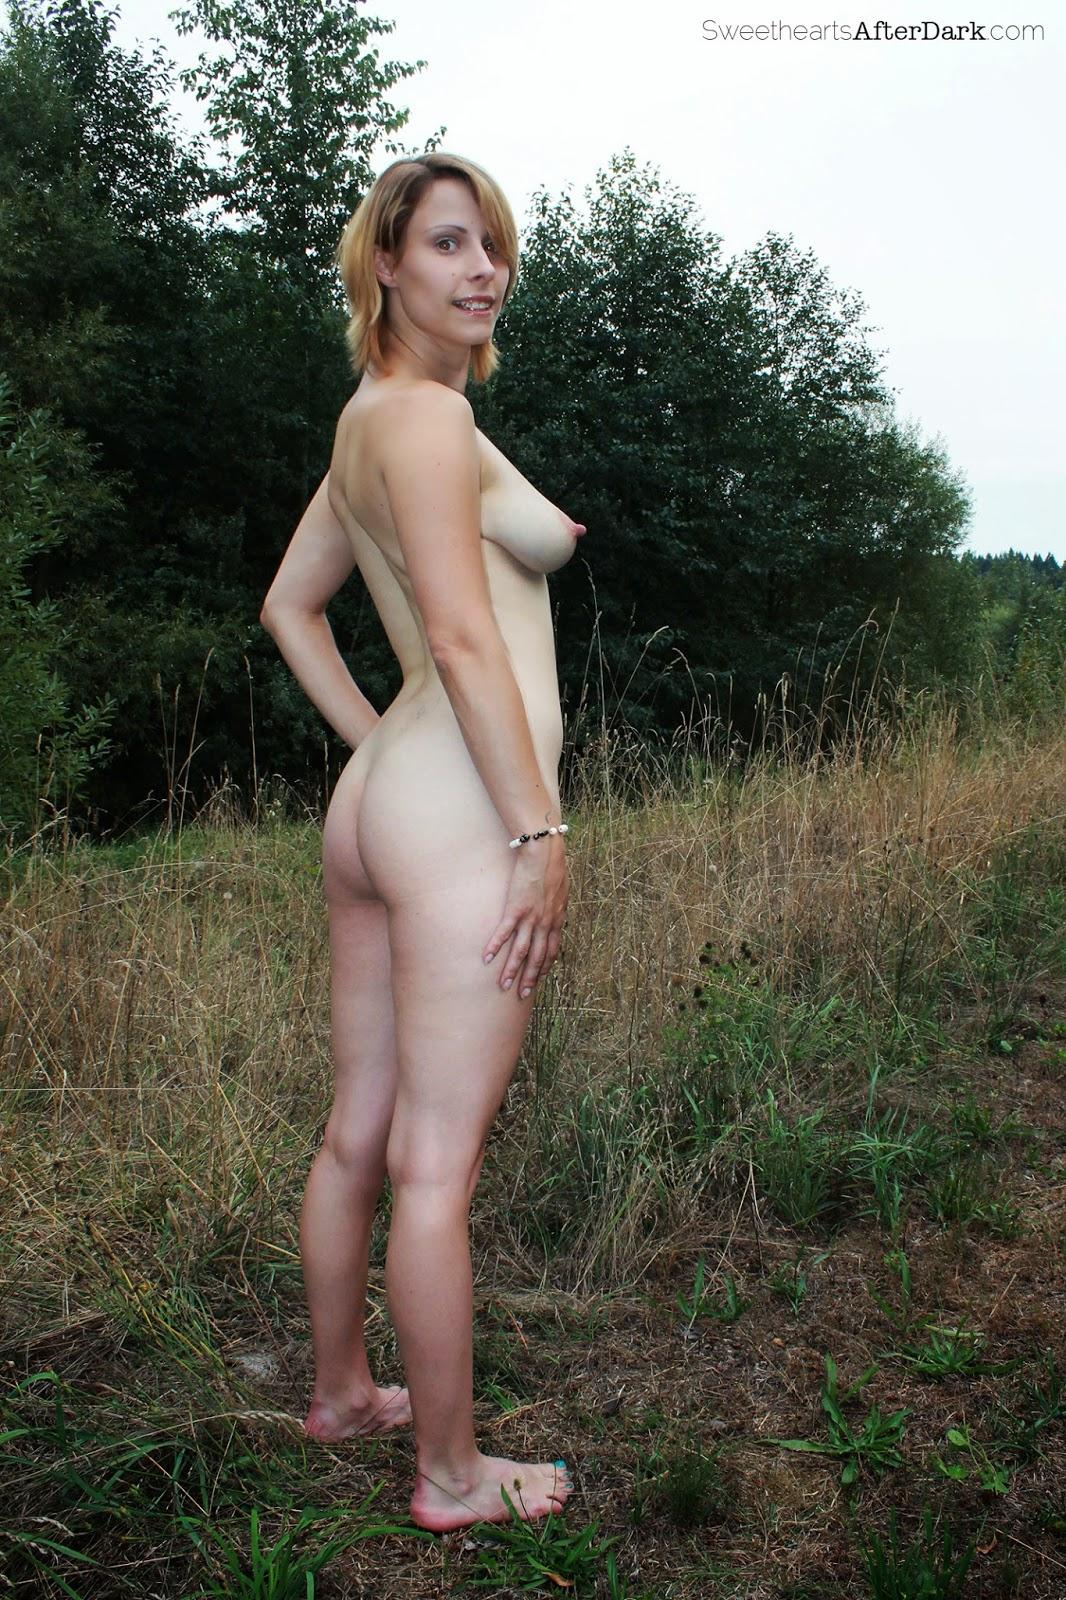 http://softbodysweethearts.blogspot.com/2014/03/harley-anne-rhodes-full-body-nudity.html